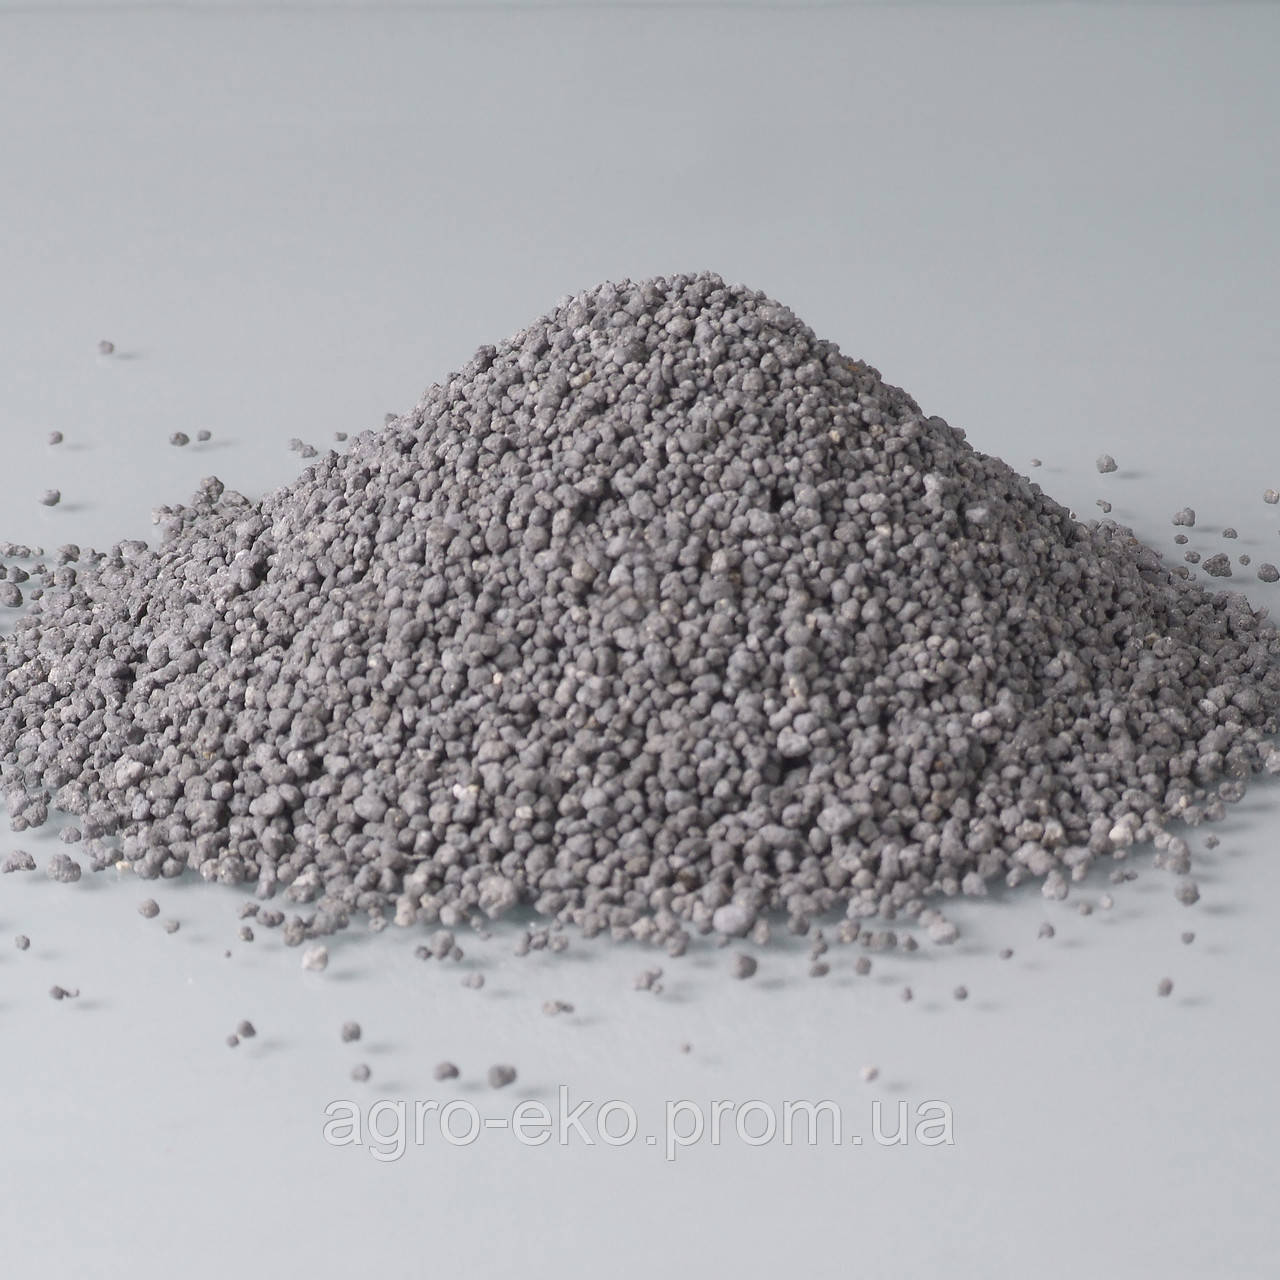 Нитроаммофоска Экоплант (Ekoplant)